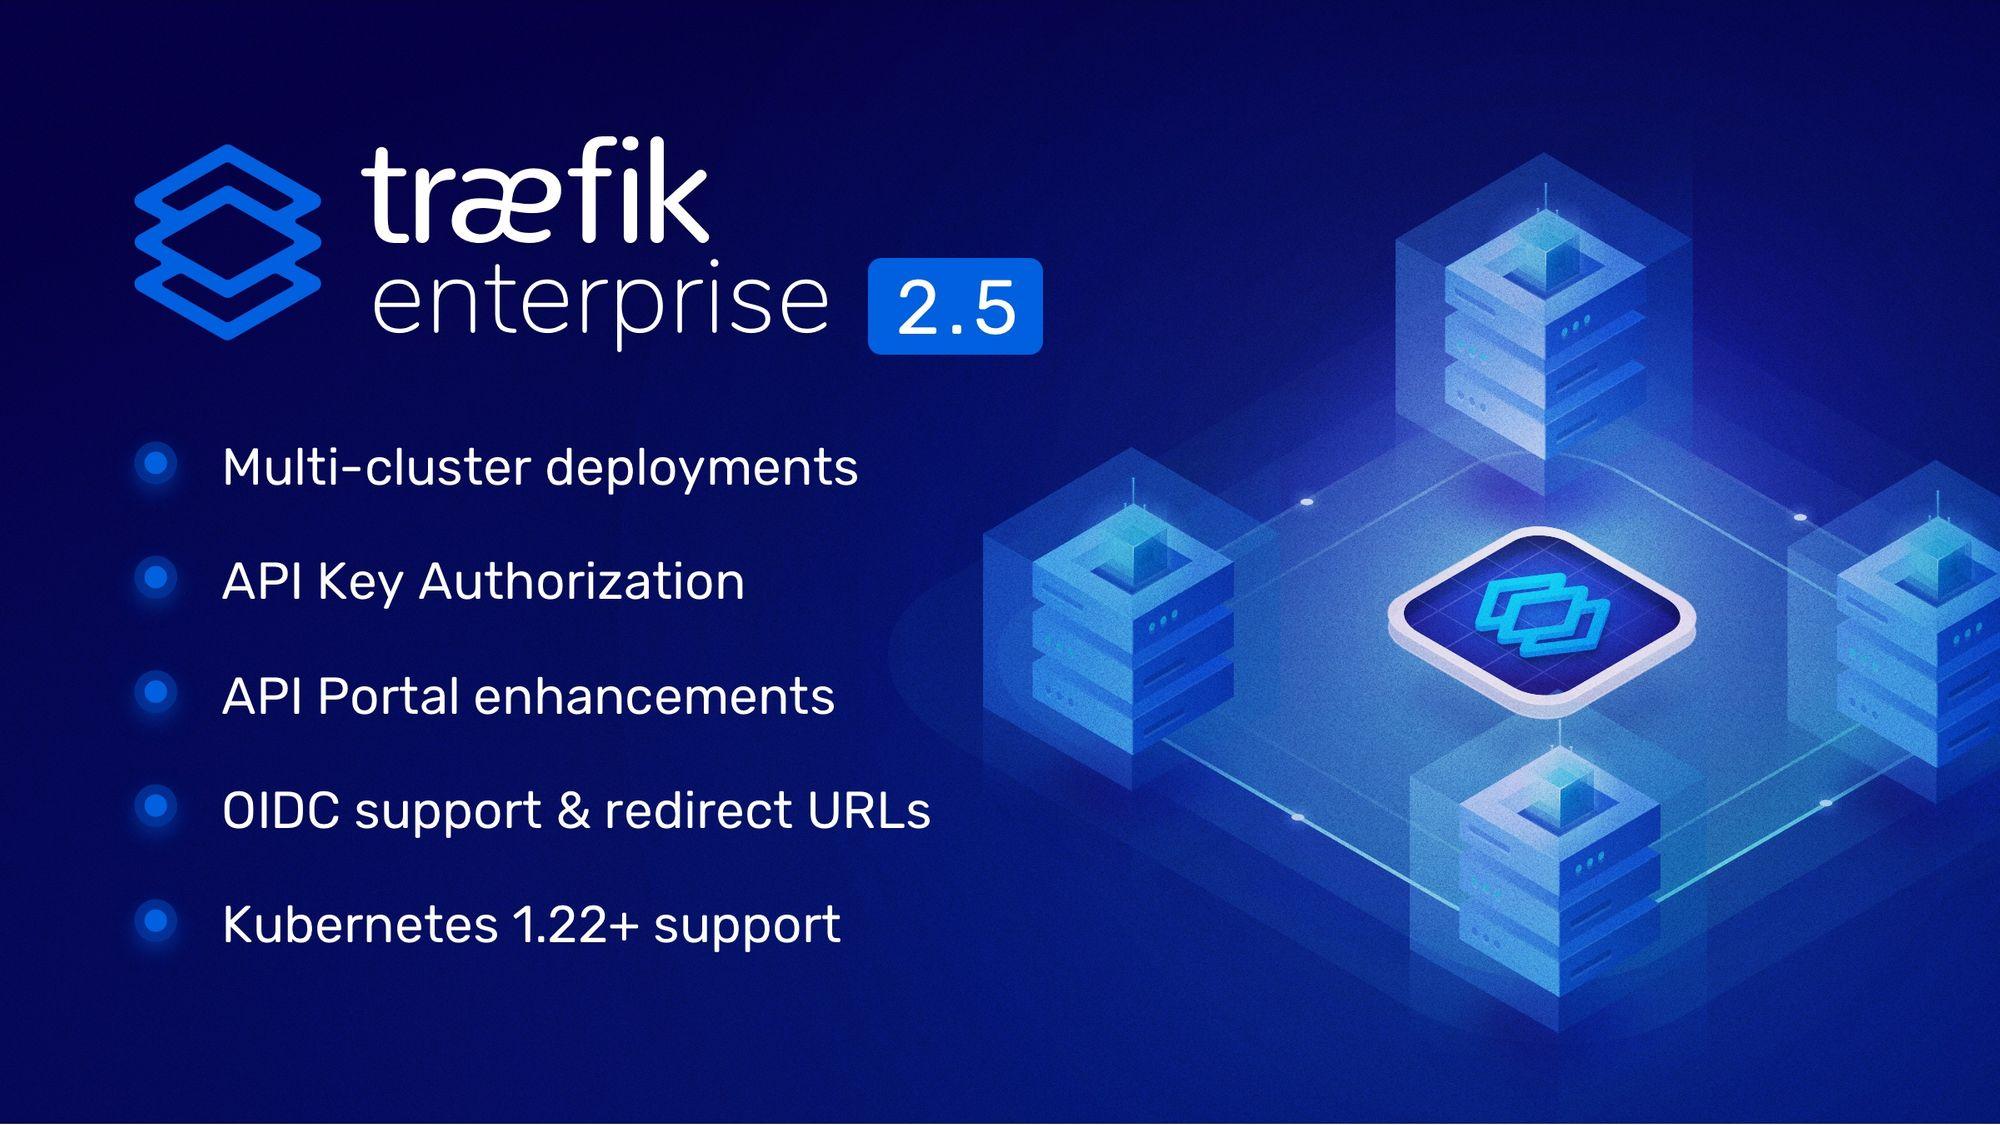 Announcing Traefik Enterprise 2.5